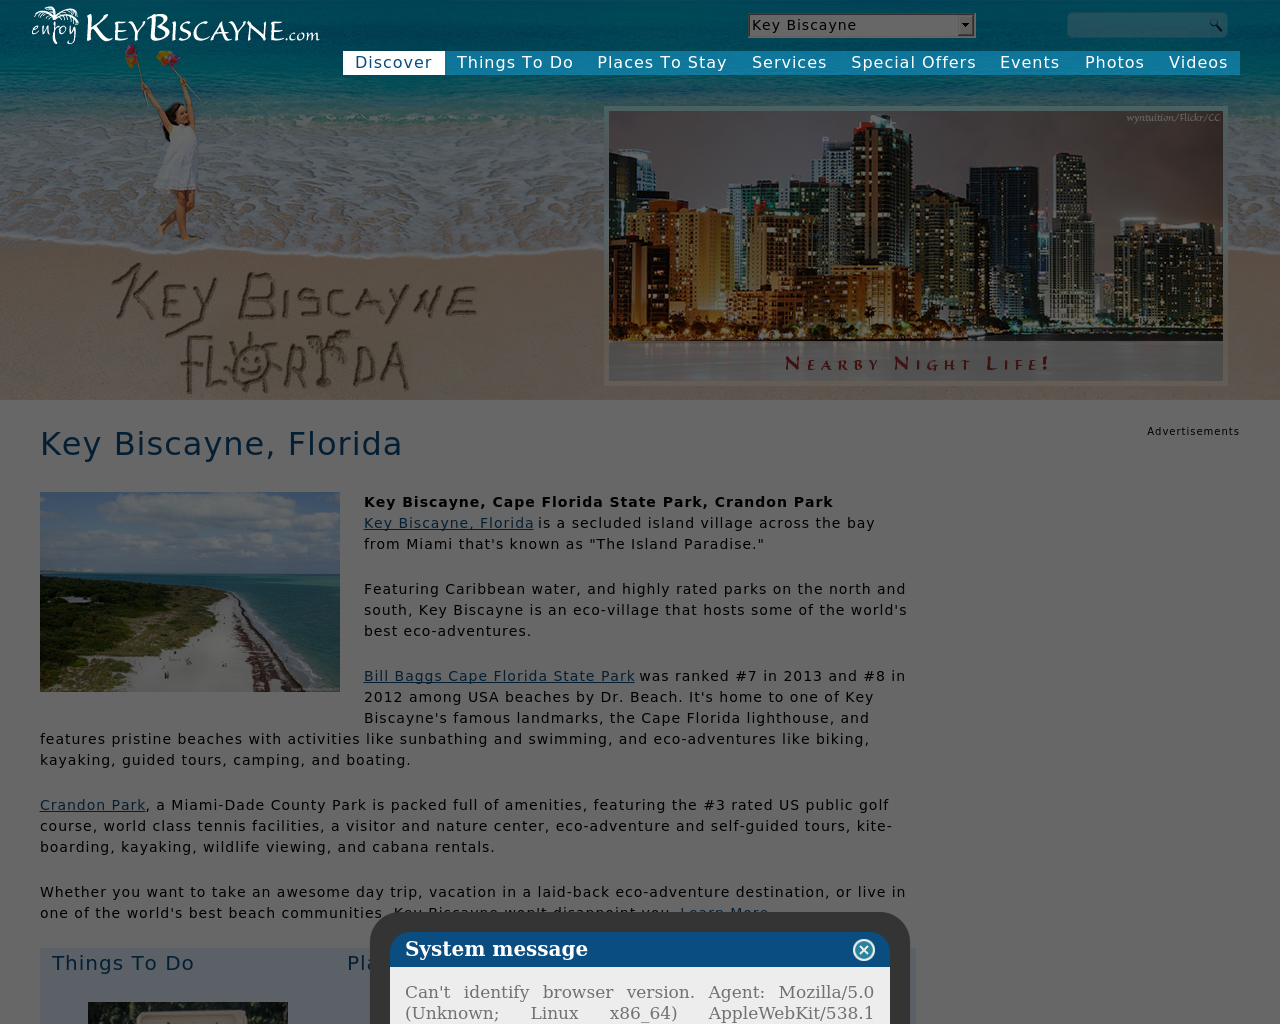 enjoyKeyBiscayne.com-Advertising-Reviews-Pricing